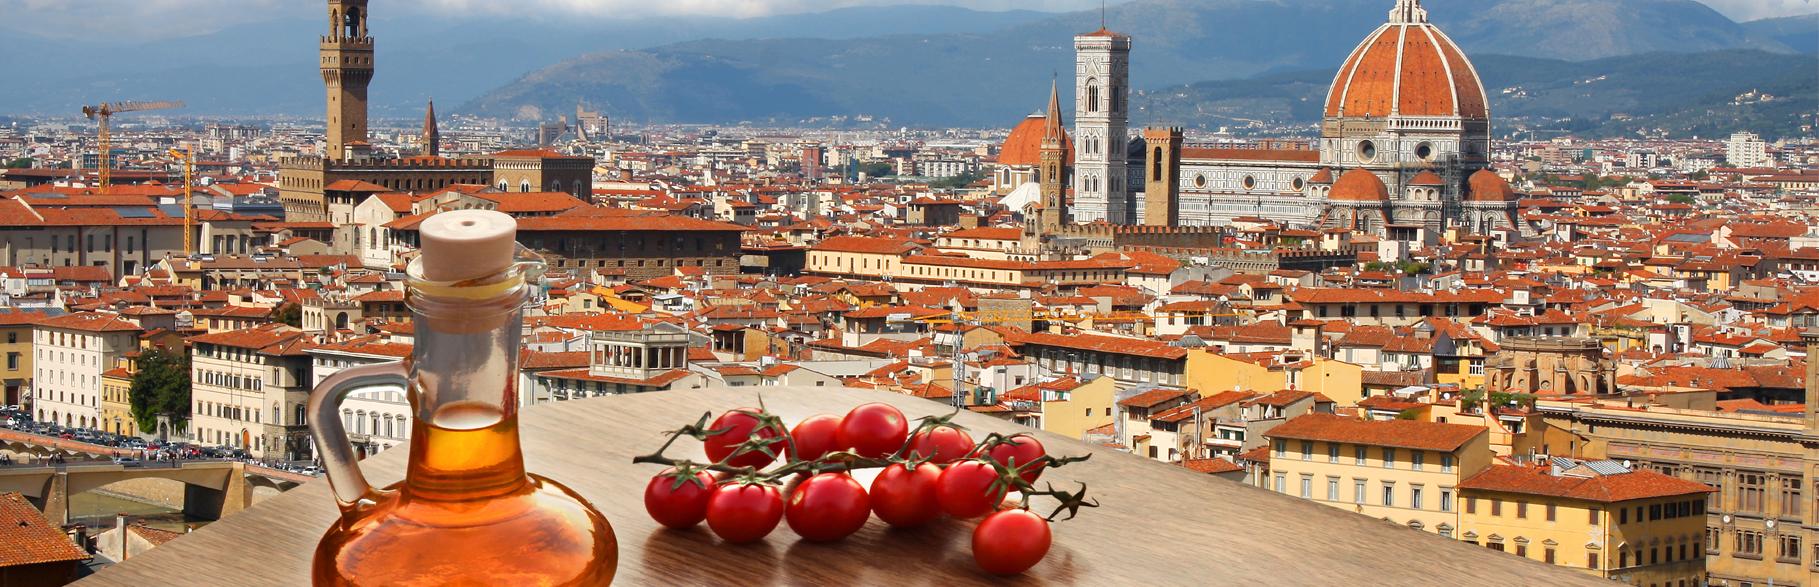 top food stops for gourmet travellers